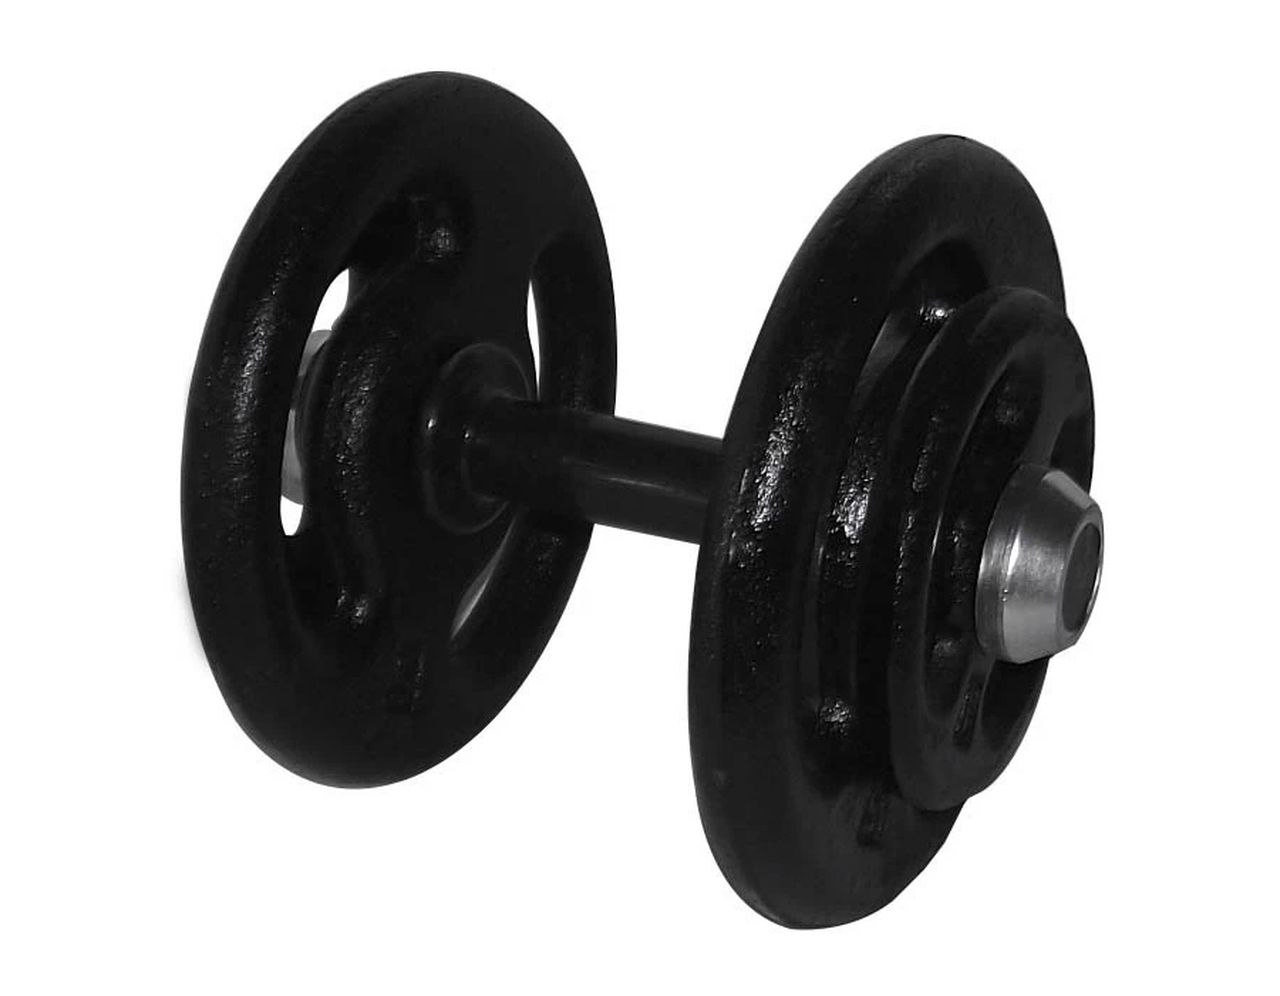 Dumbbell Pintado Pegada Emborrachada Academia Fitness 16kg  - Panela de Ferro Fundido